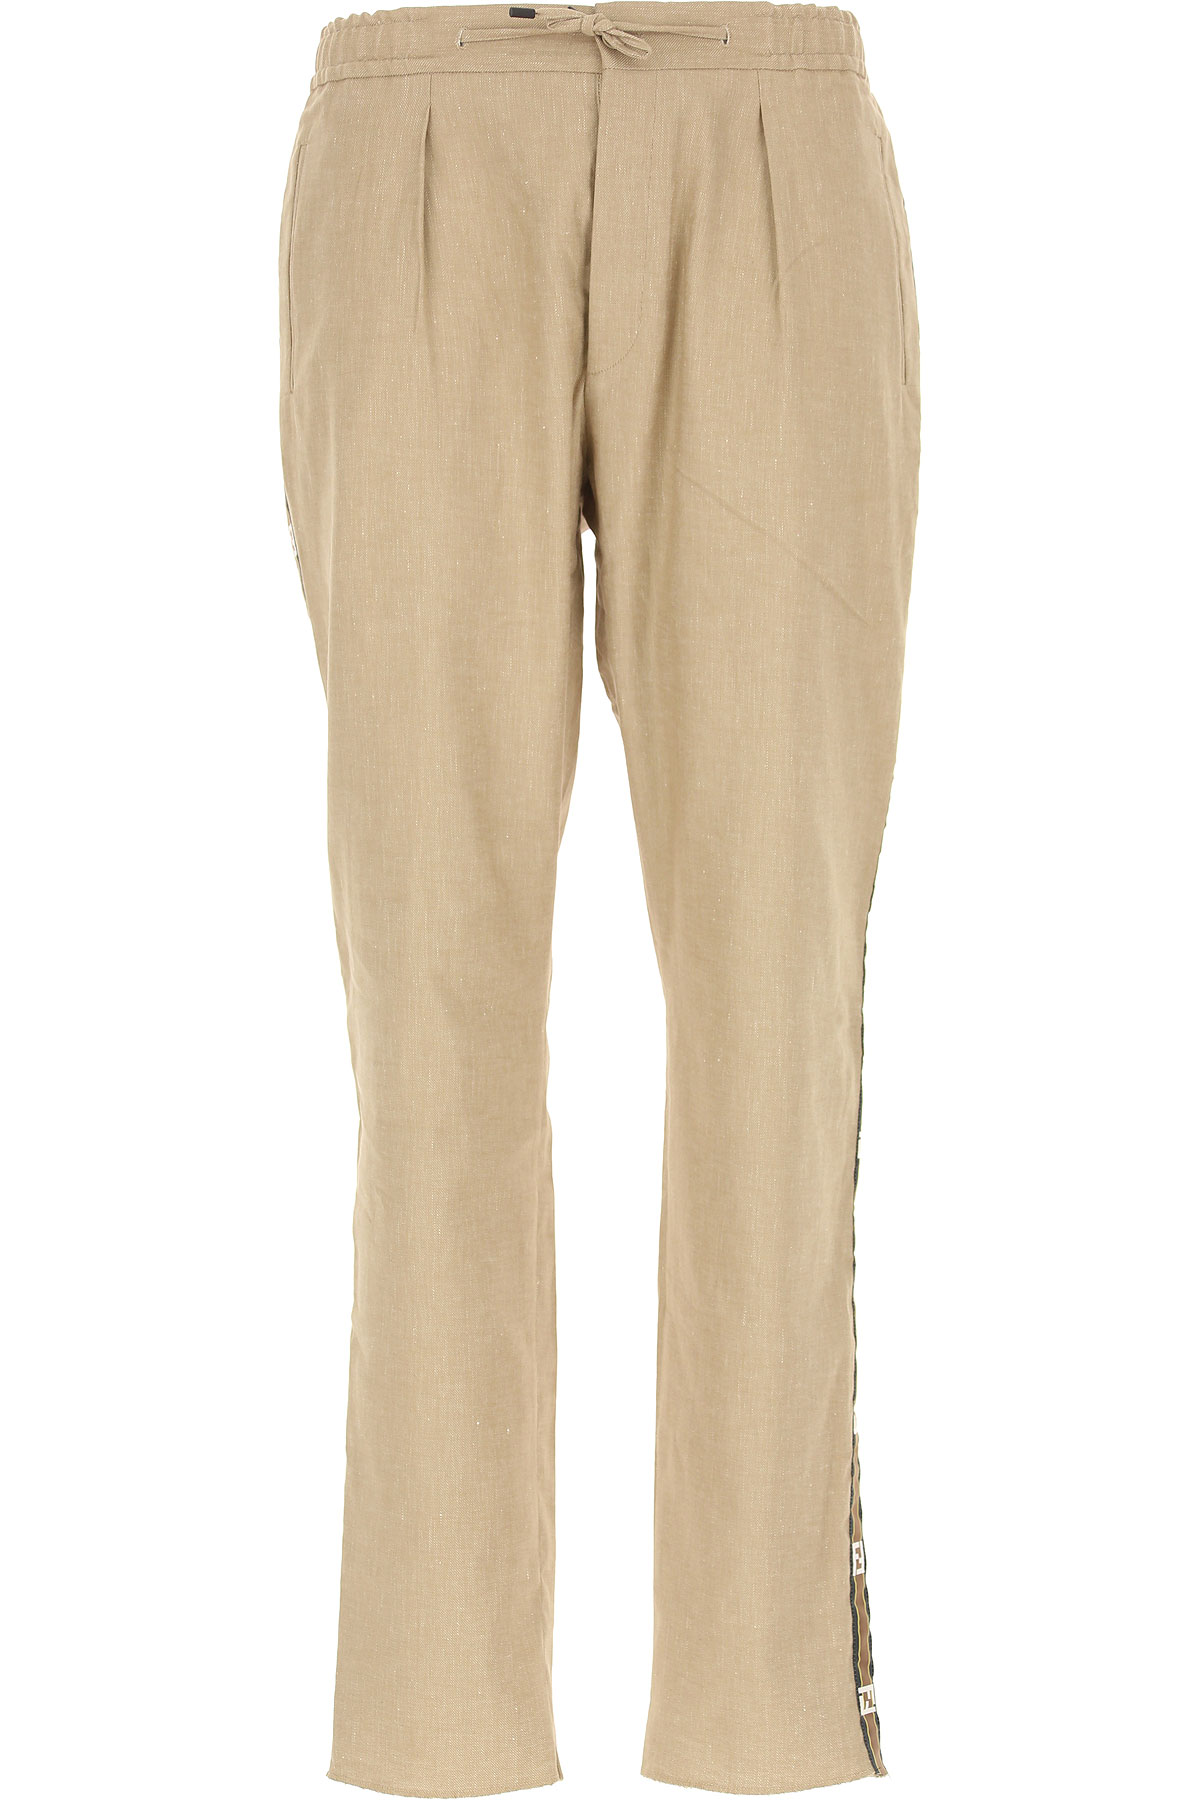 93fb244cfe8 Fendi Παντελόνια για Άνδρες Σε Έκπτωση, Μπεζ Πέτρα, λινό, 2019, 48 50